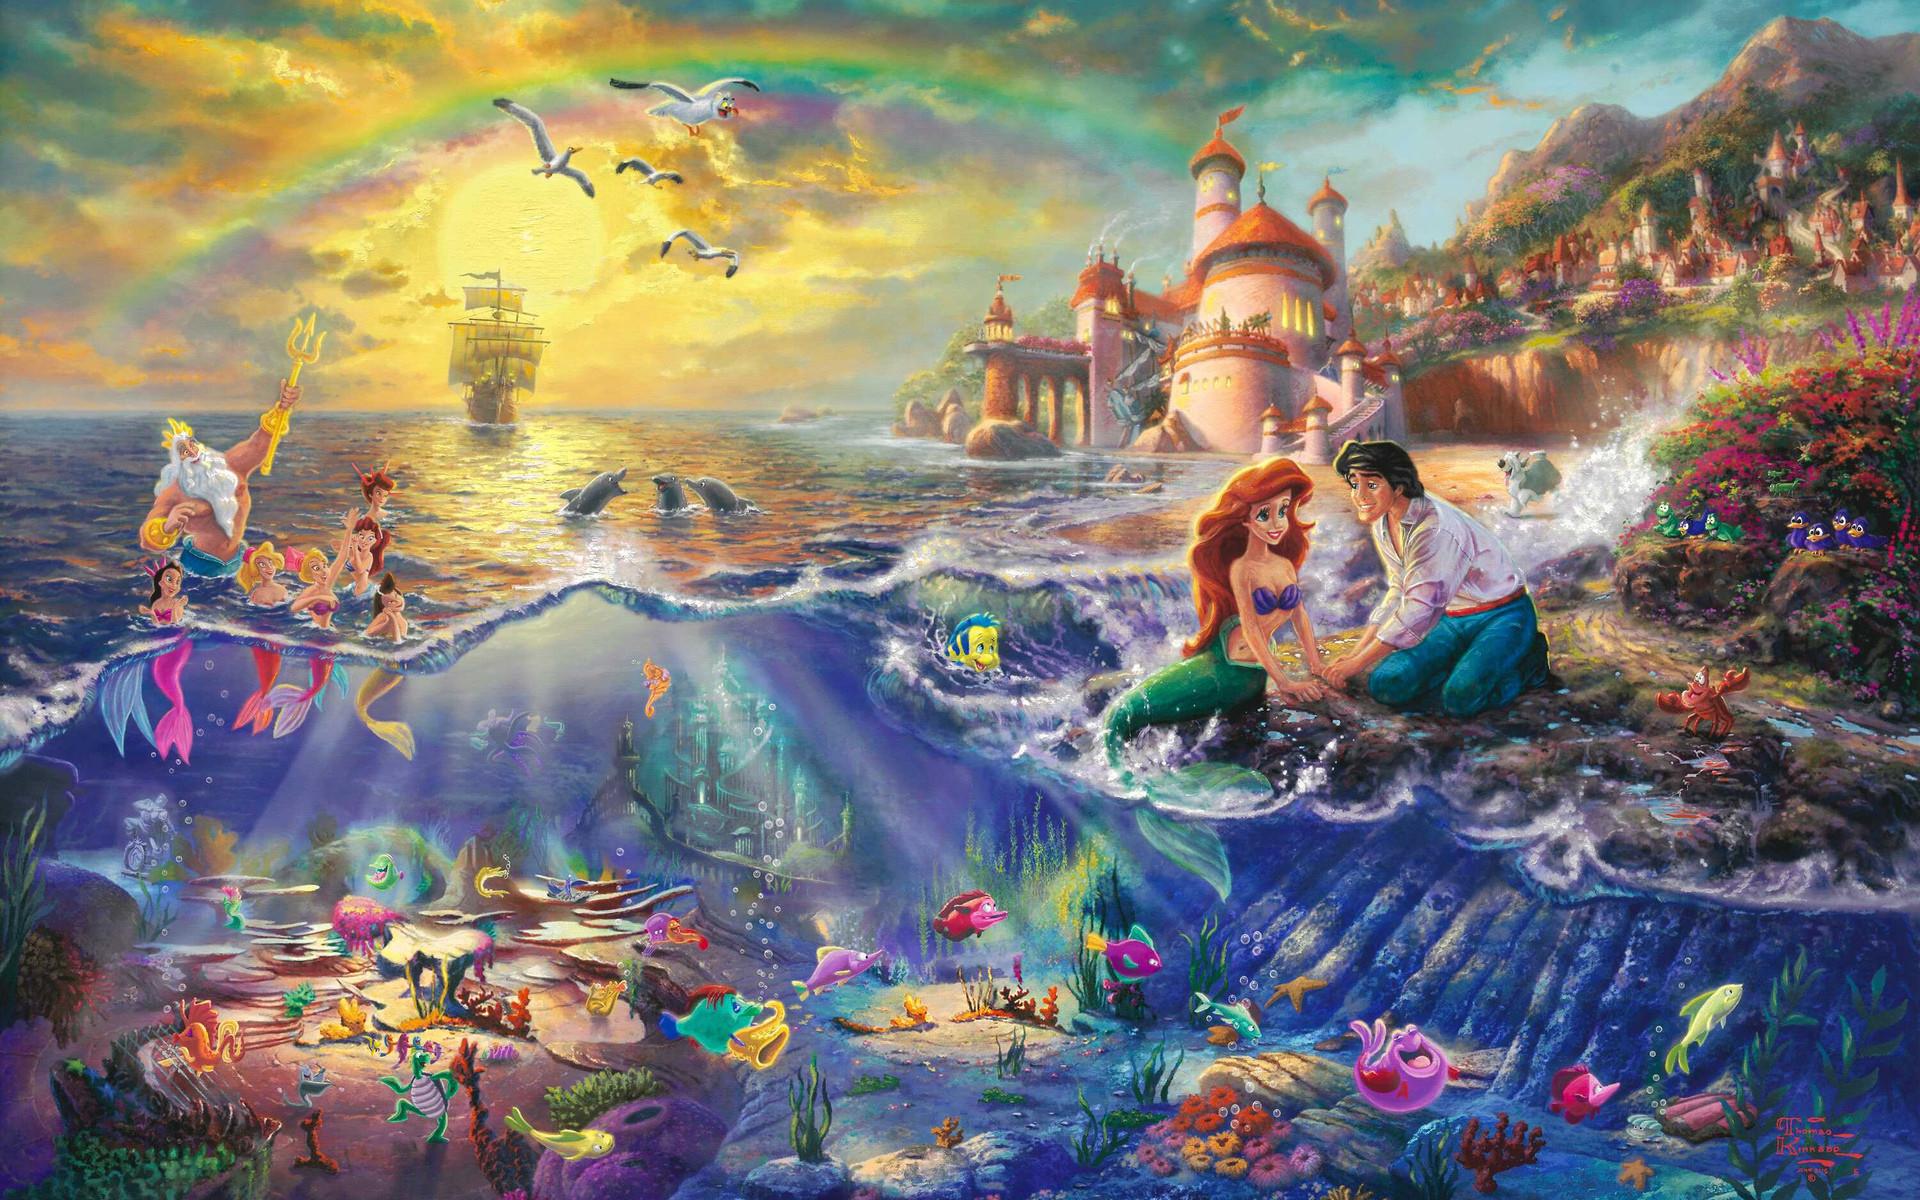 Movie The Little Mermaid Wallpaper